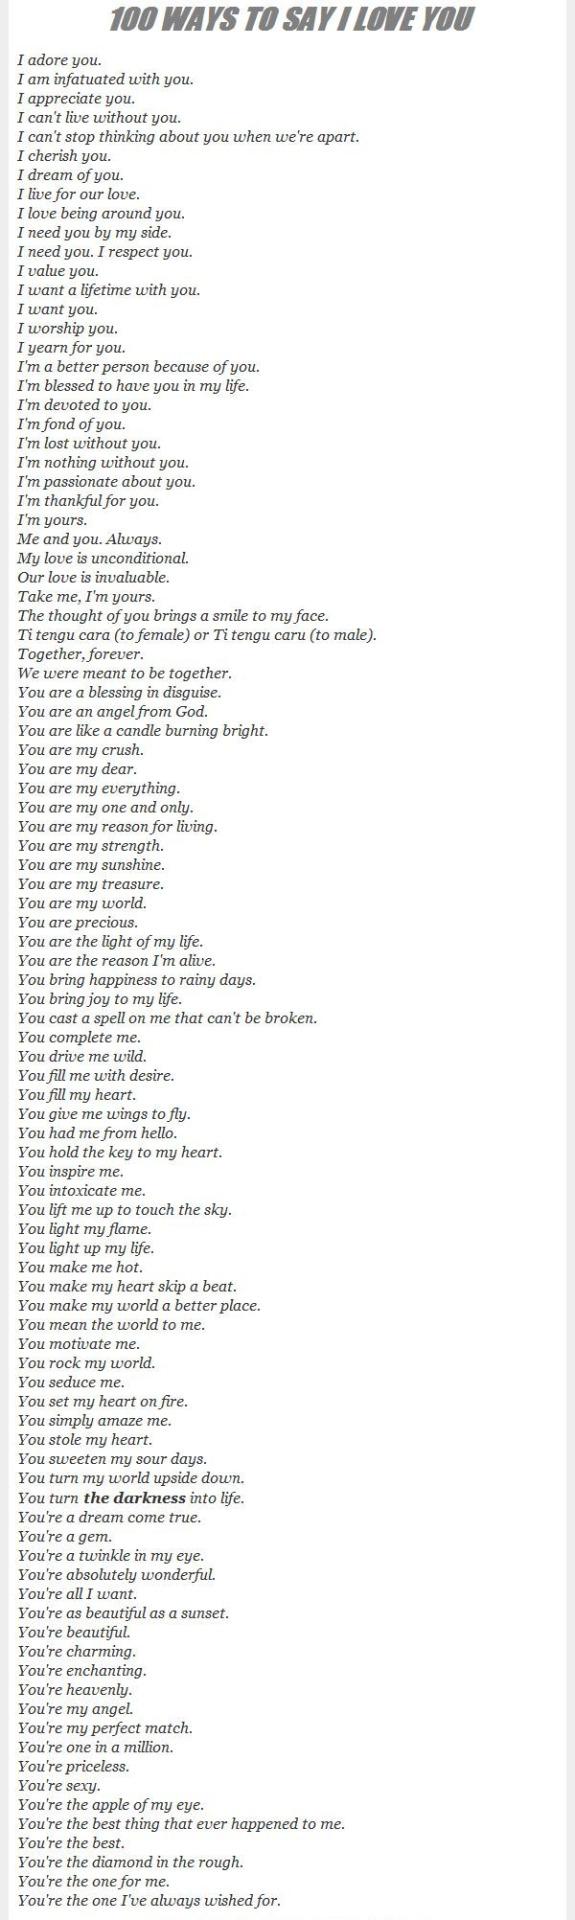 Beautiful ways to say: I love you